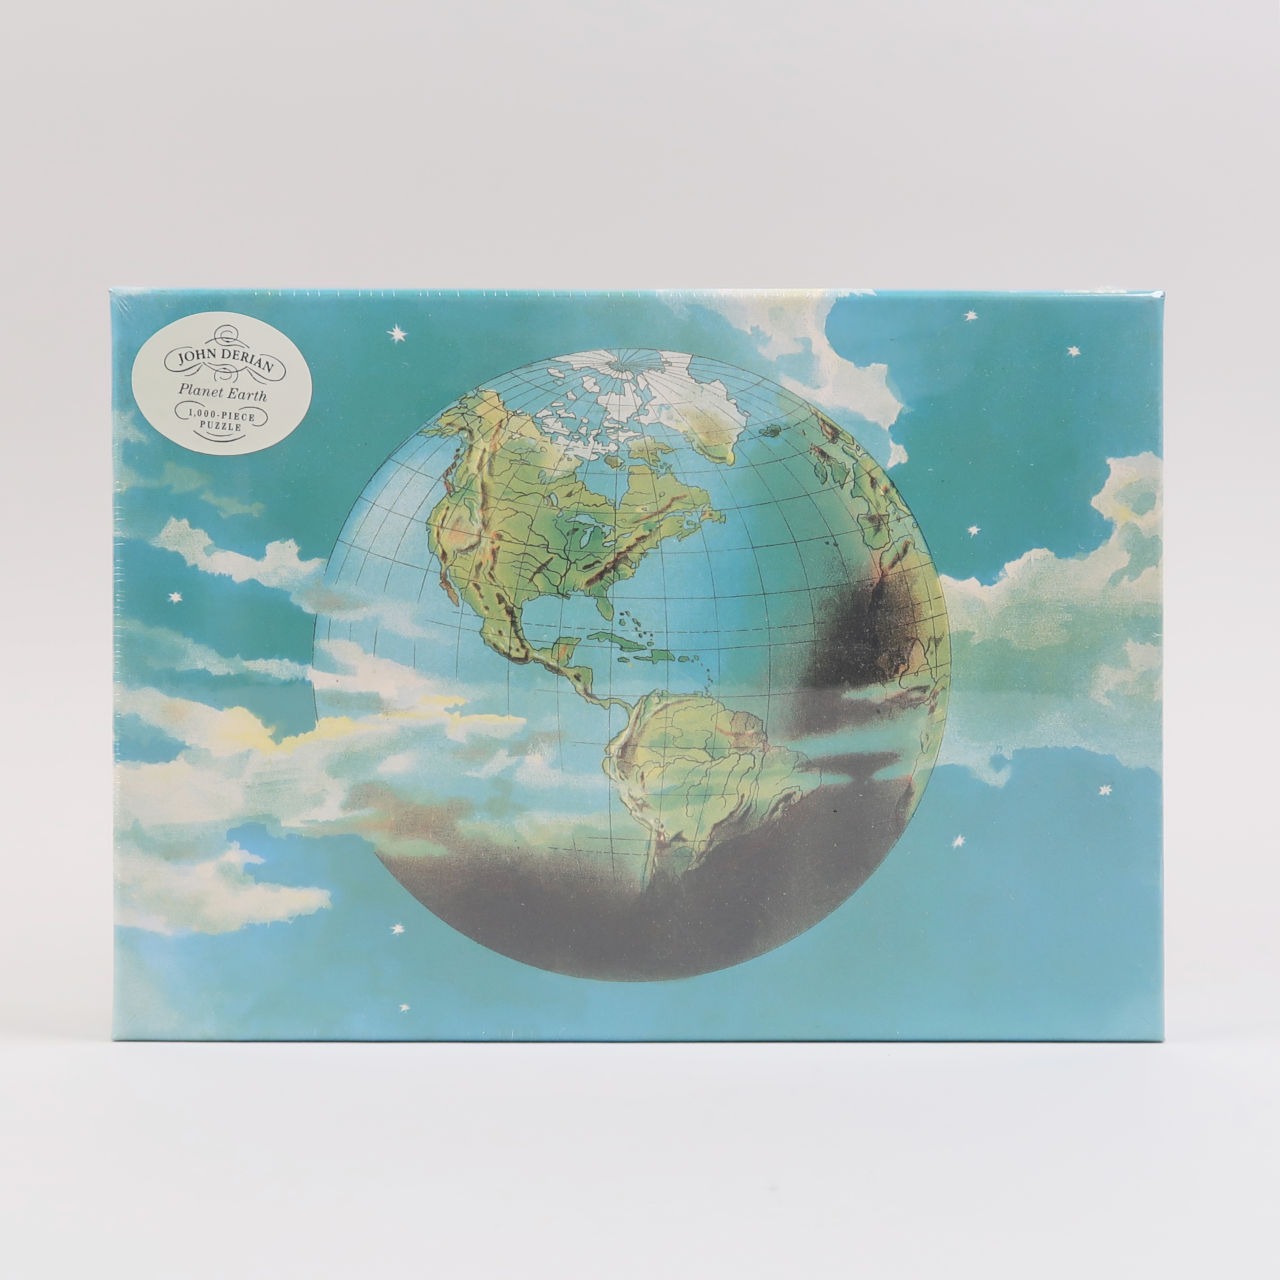 Planet Earth - John Derian - 1000 Piece Puzzle